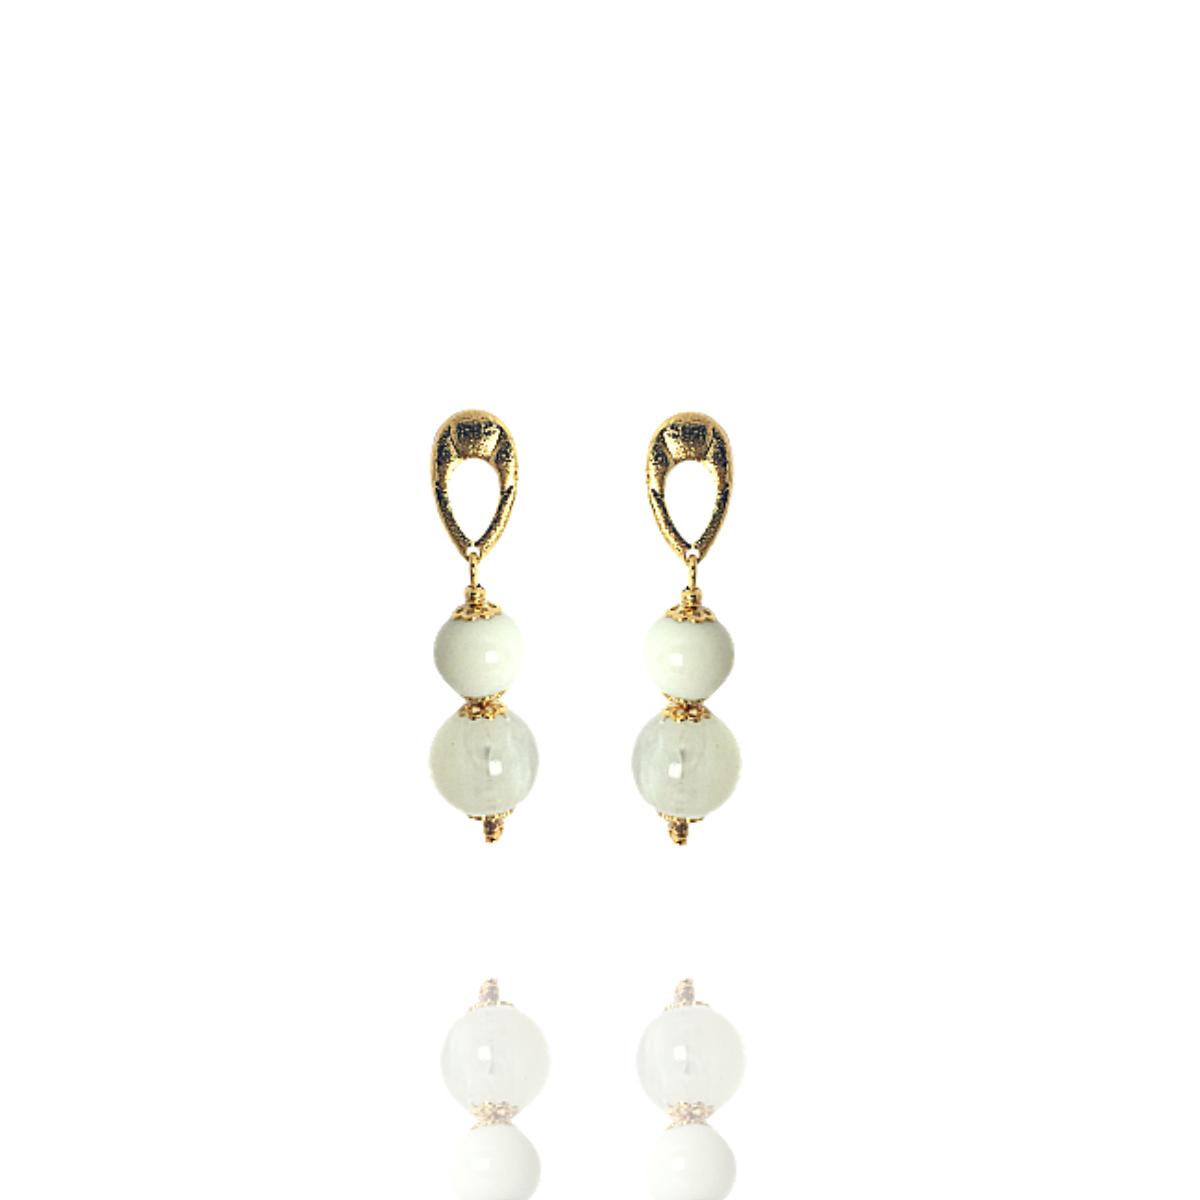 Brinco Barbara Strauss Semi Joia Fushimi Em Resina Lalique Branca, Rev. Em Ouro Amarelo 18K